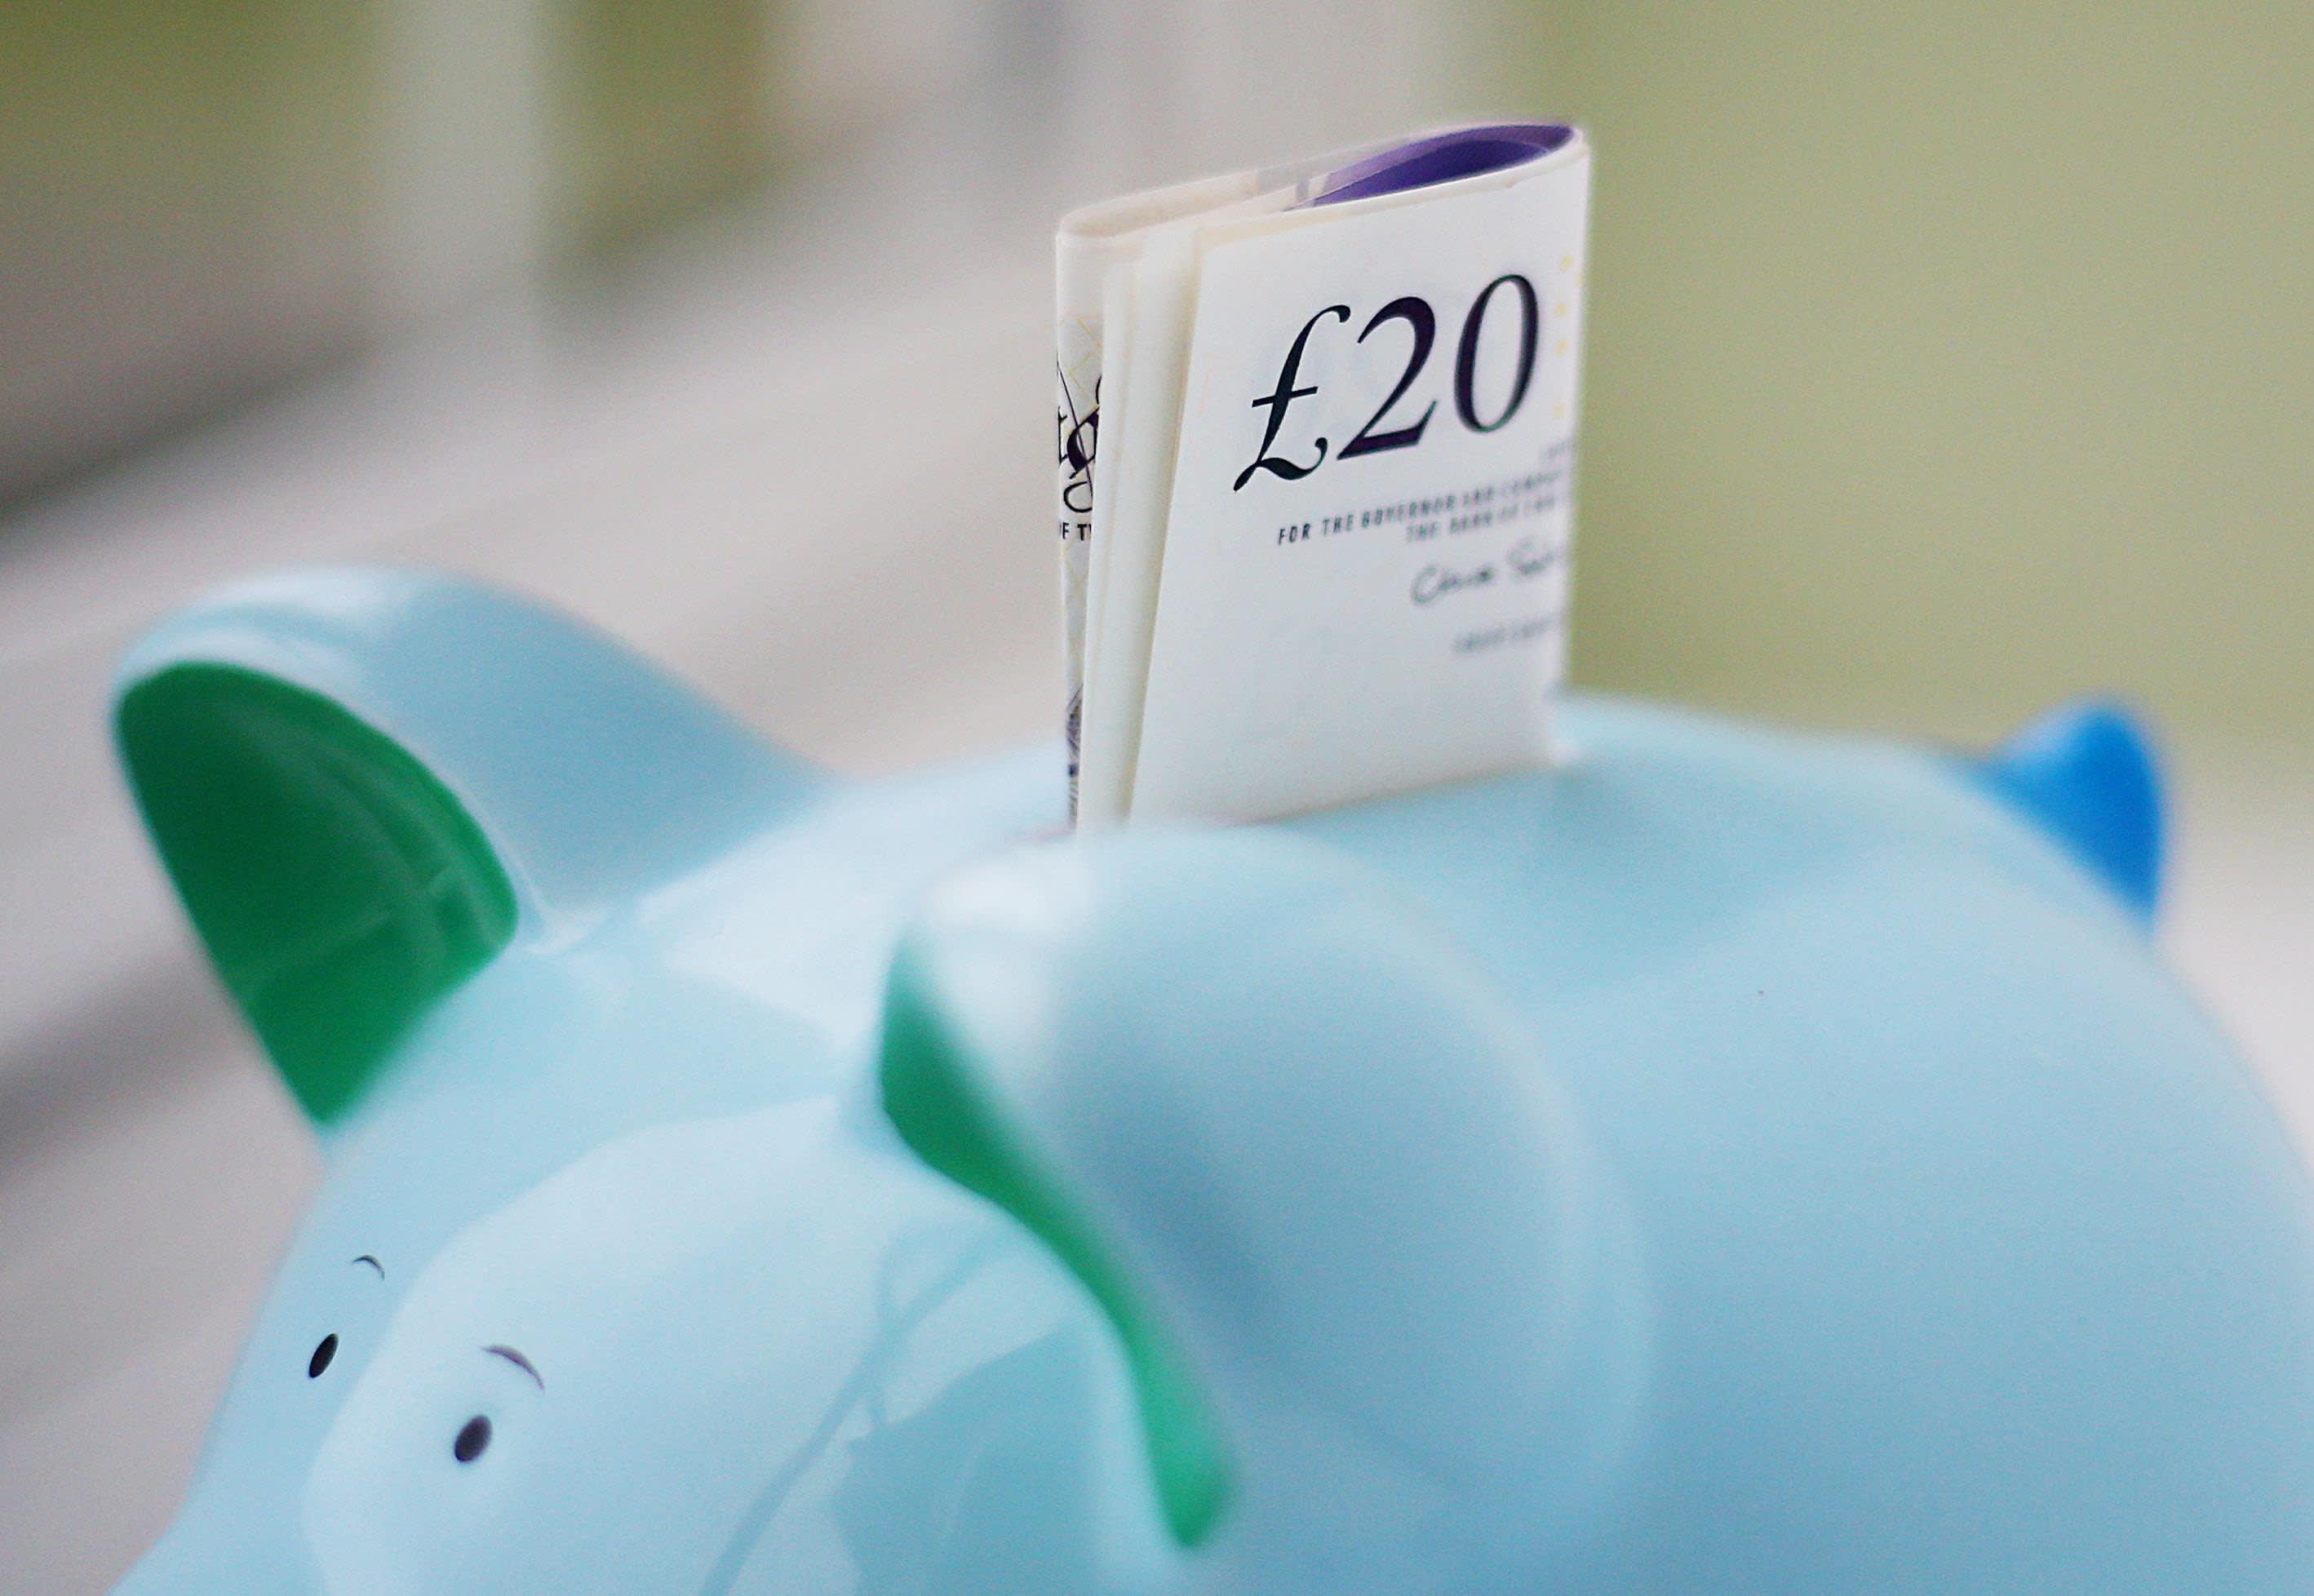 Regulator warns on using alternative funds for DC schemes